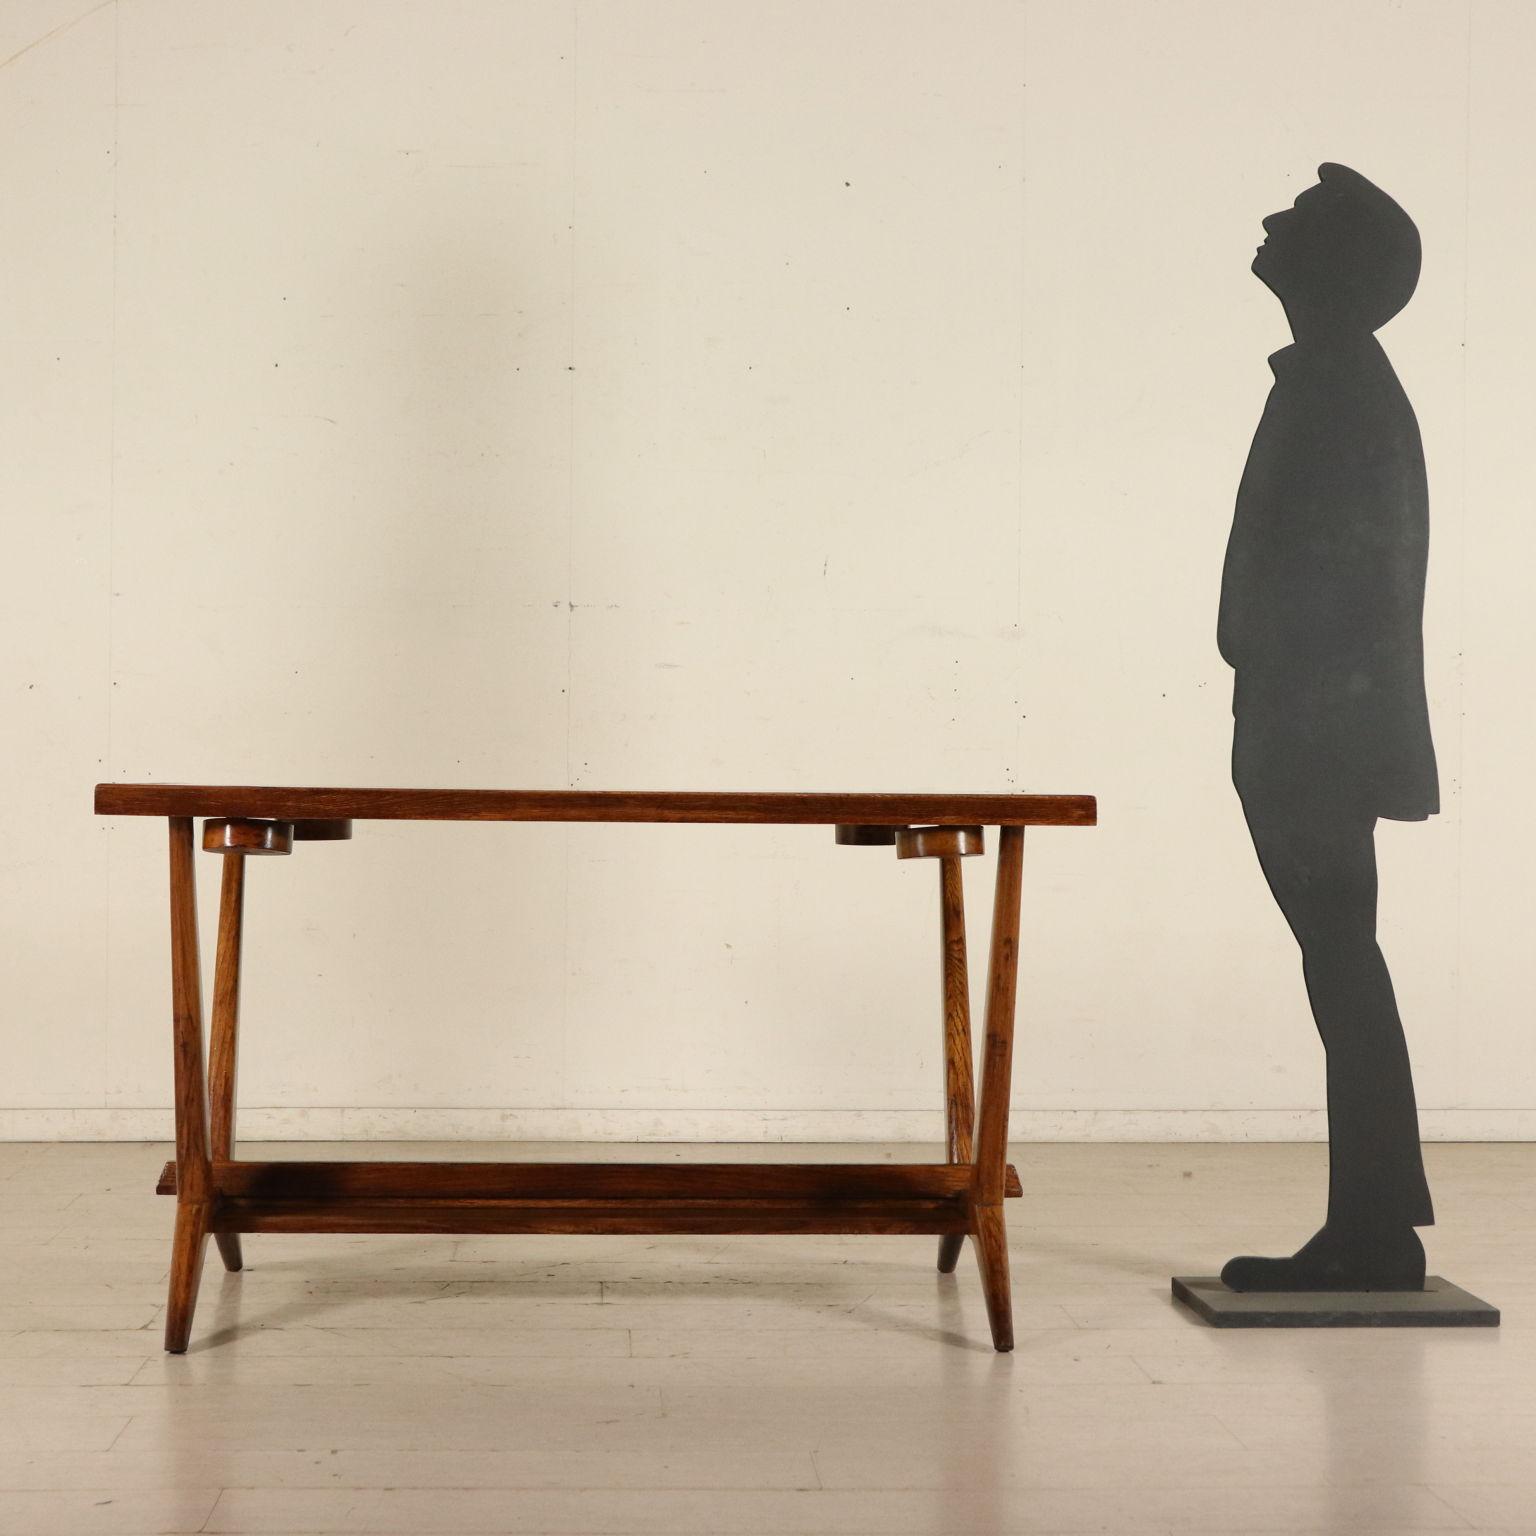 Tavolo da gioco tavoli modernariato - Blokus gioco da tavolo ...